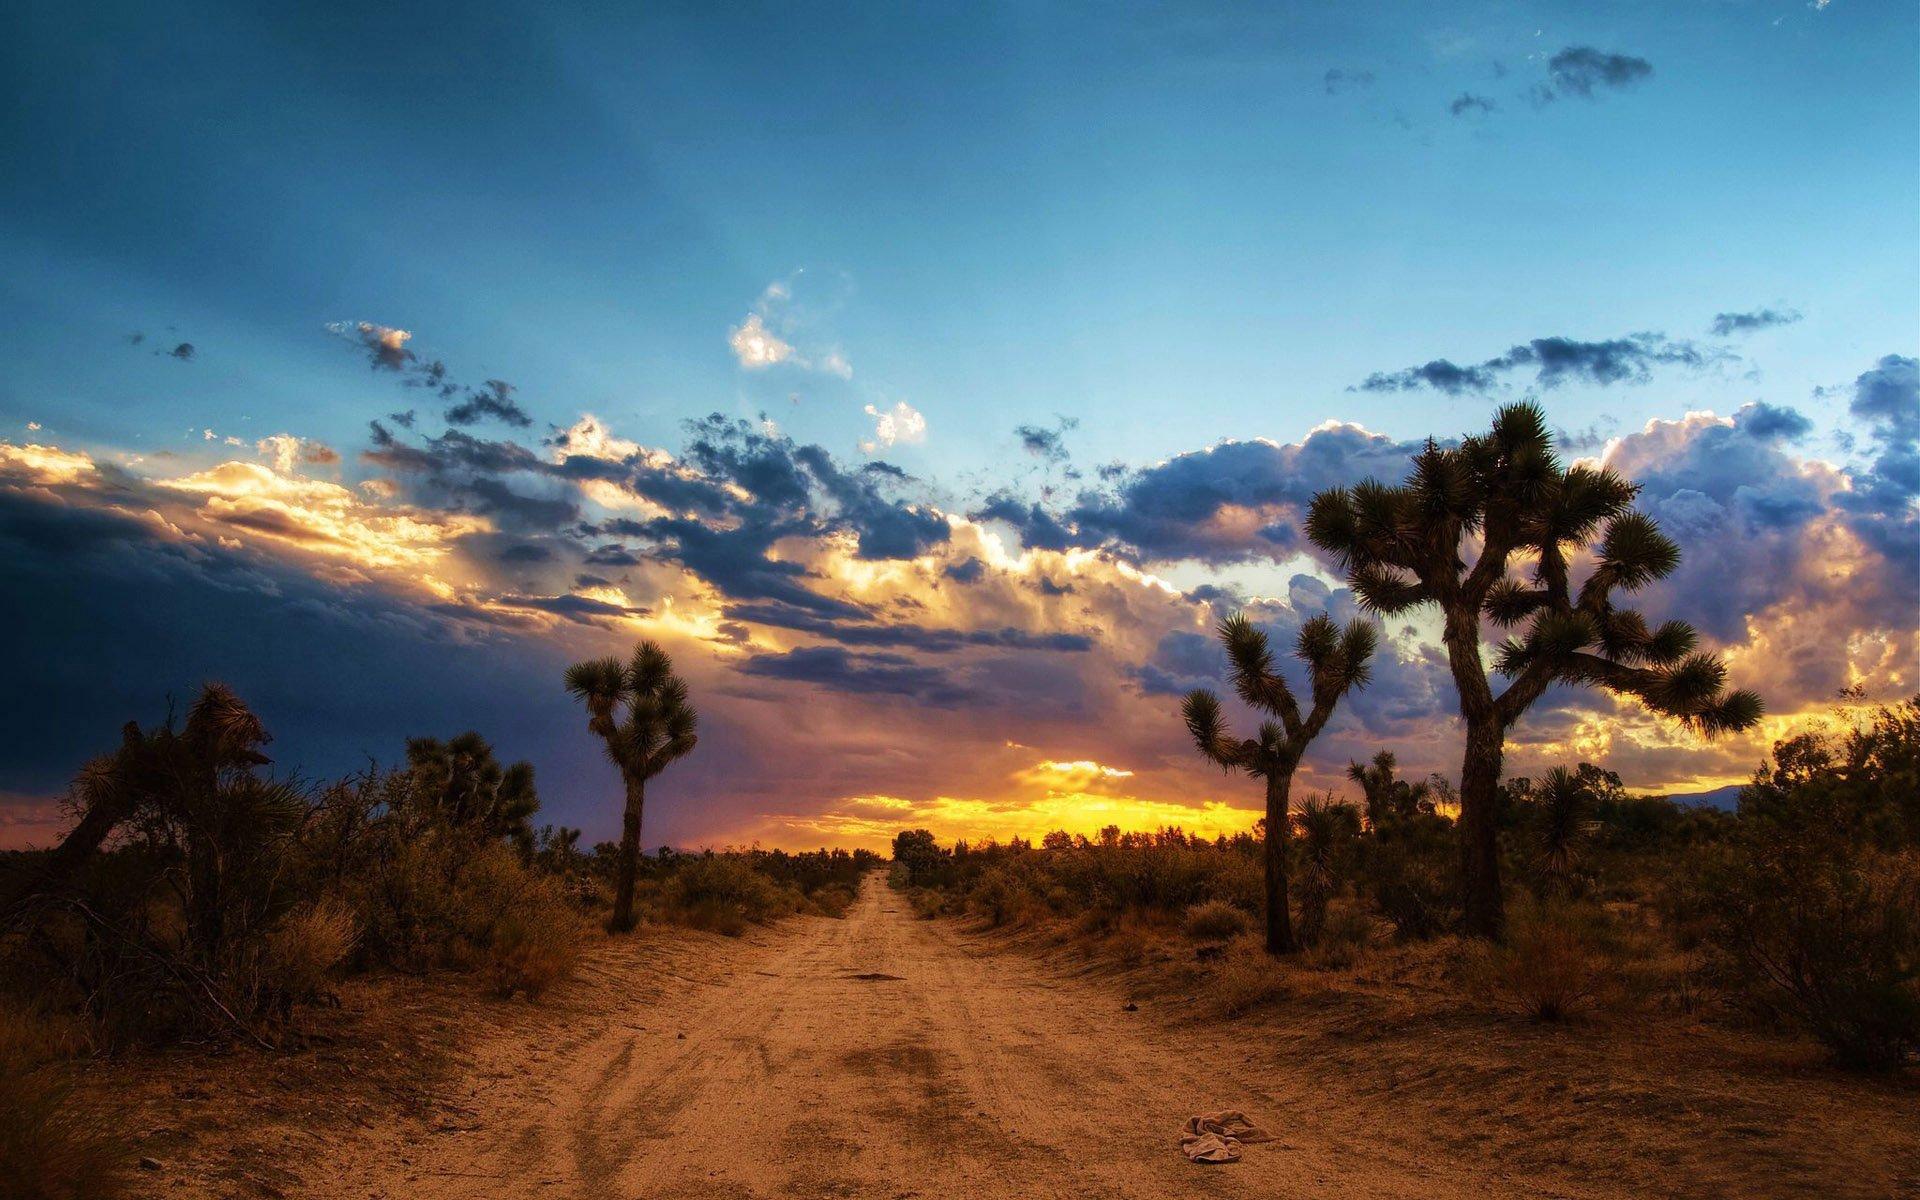 desert wallpaper cactus hd - photo #31